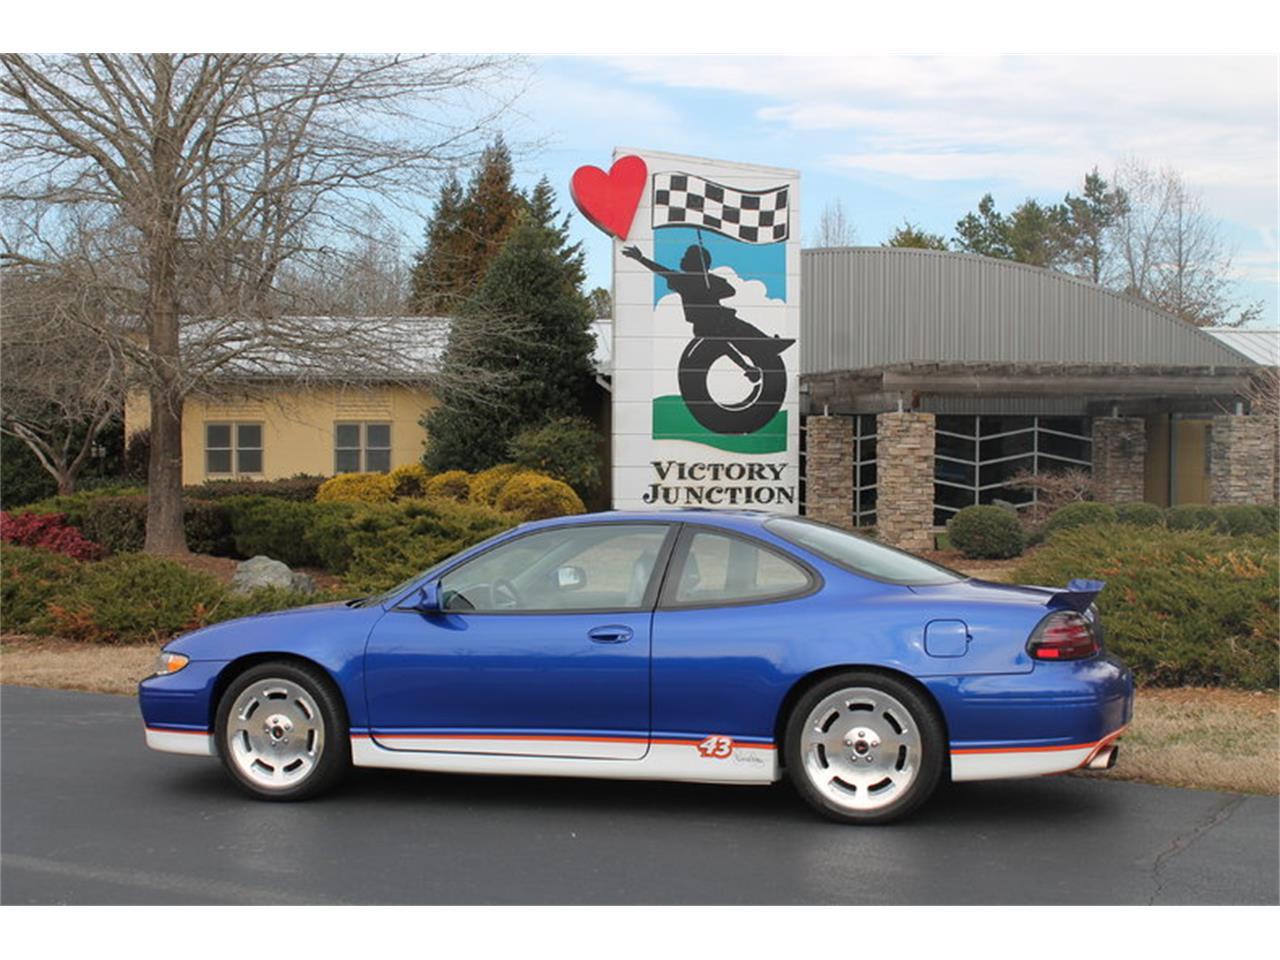 Large Picture Of 1999 Pontiac Grand Prix GTP Richard Petty Concept Located In Greensboro North Carolina